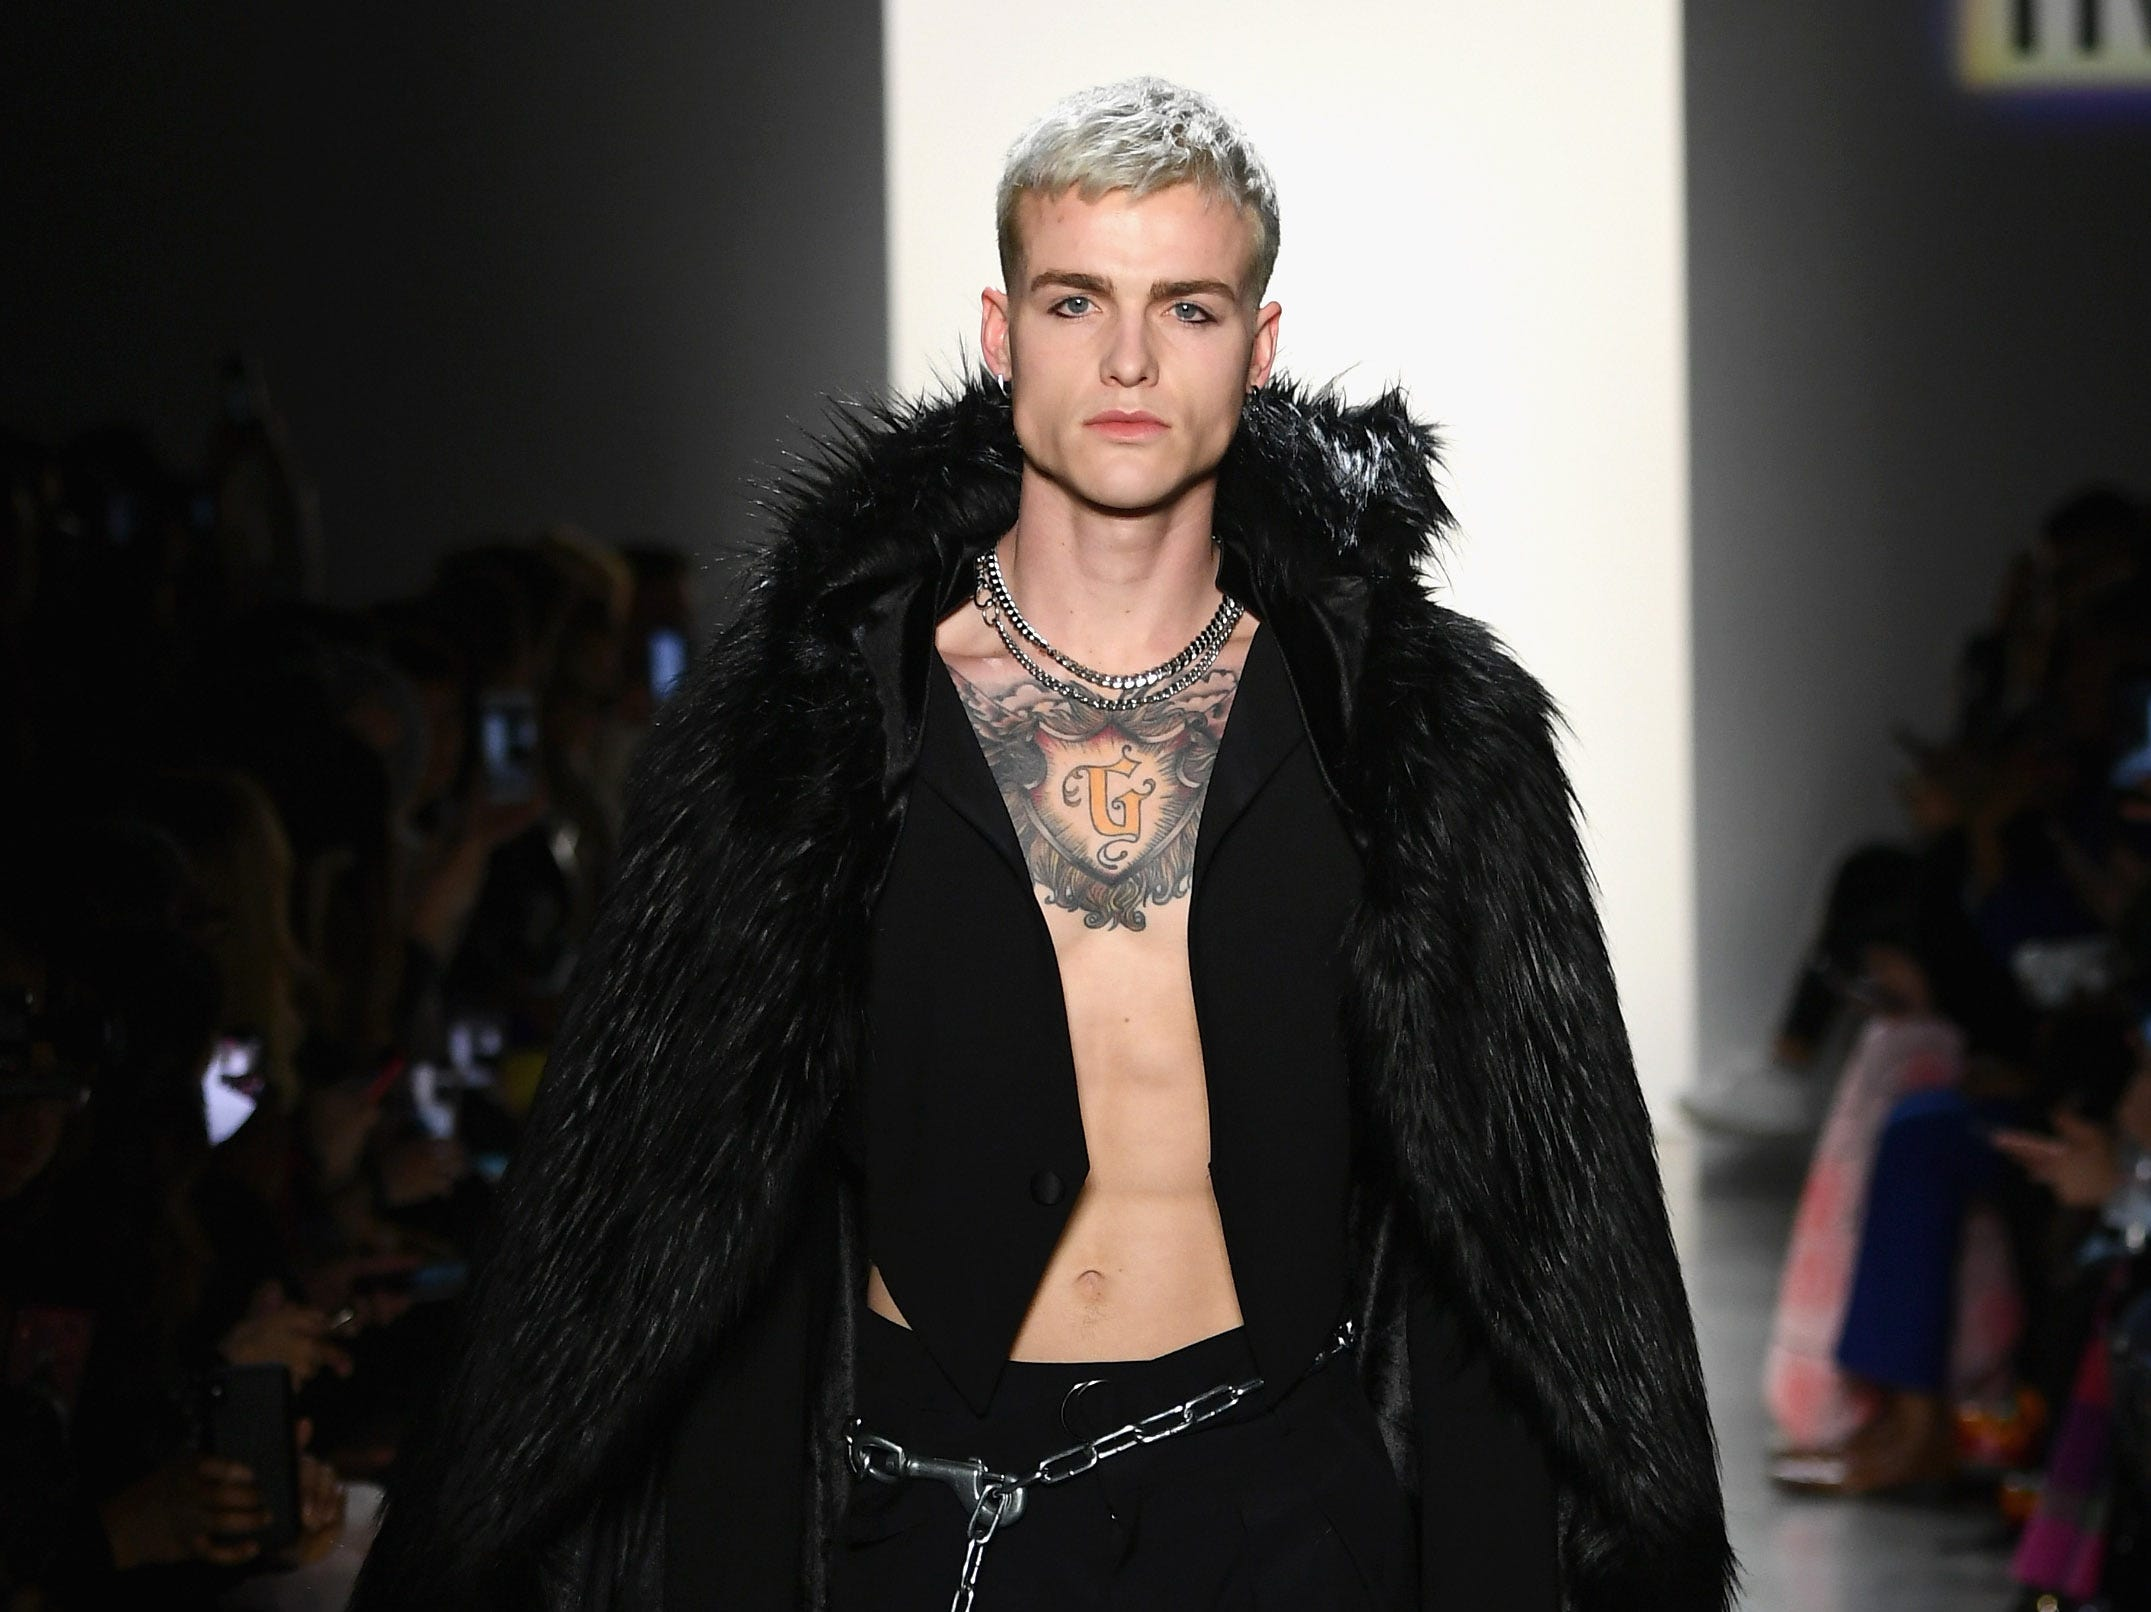 A model walks the runway for Hakan Akkaya's fashion show during New York Fashion Week